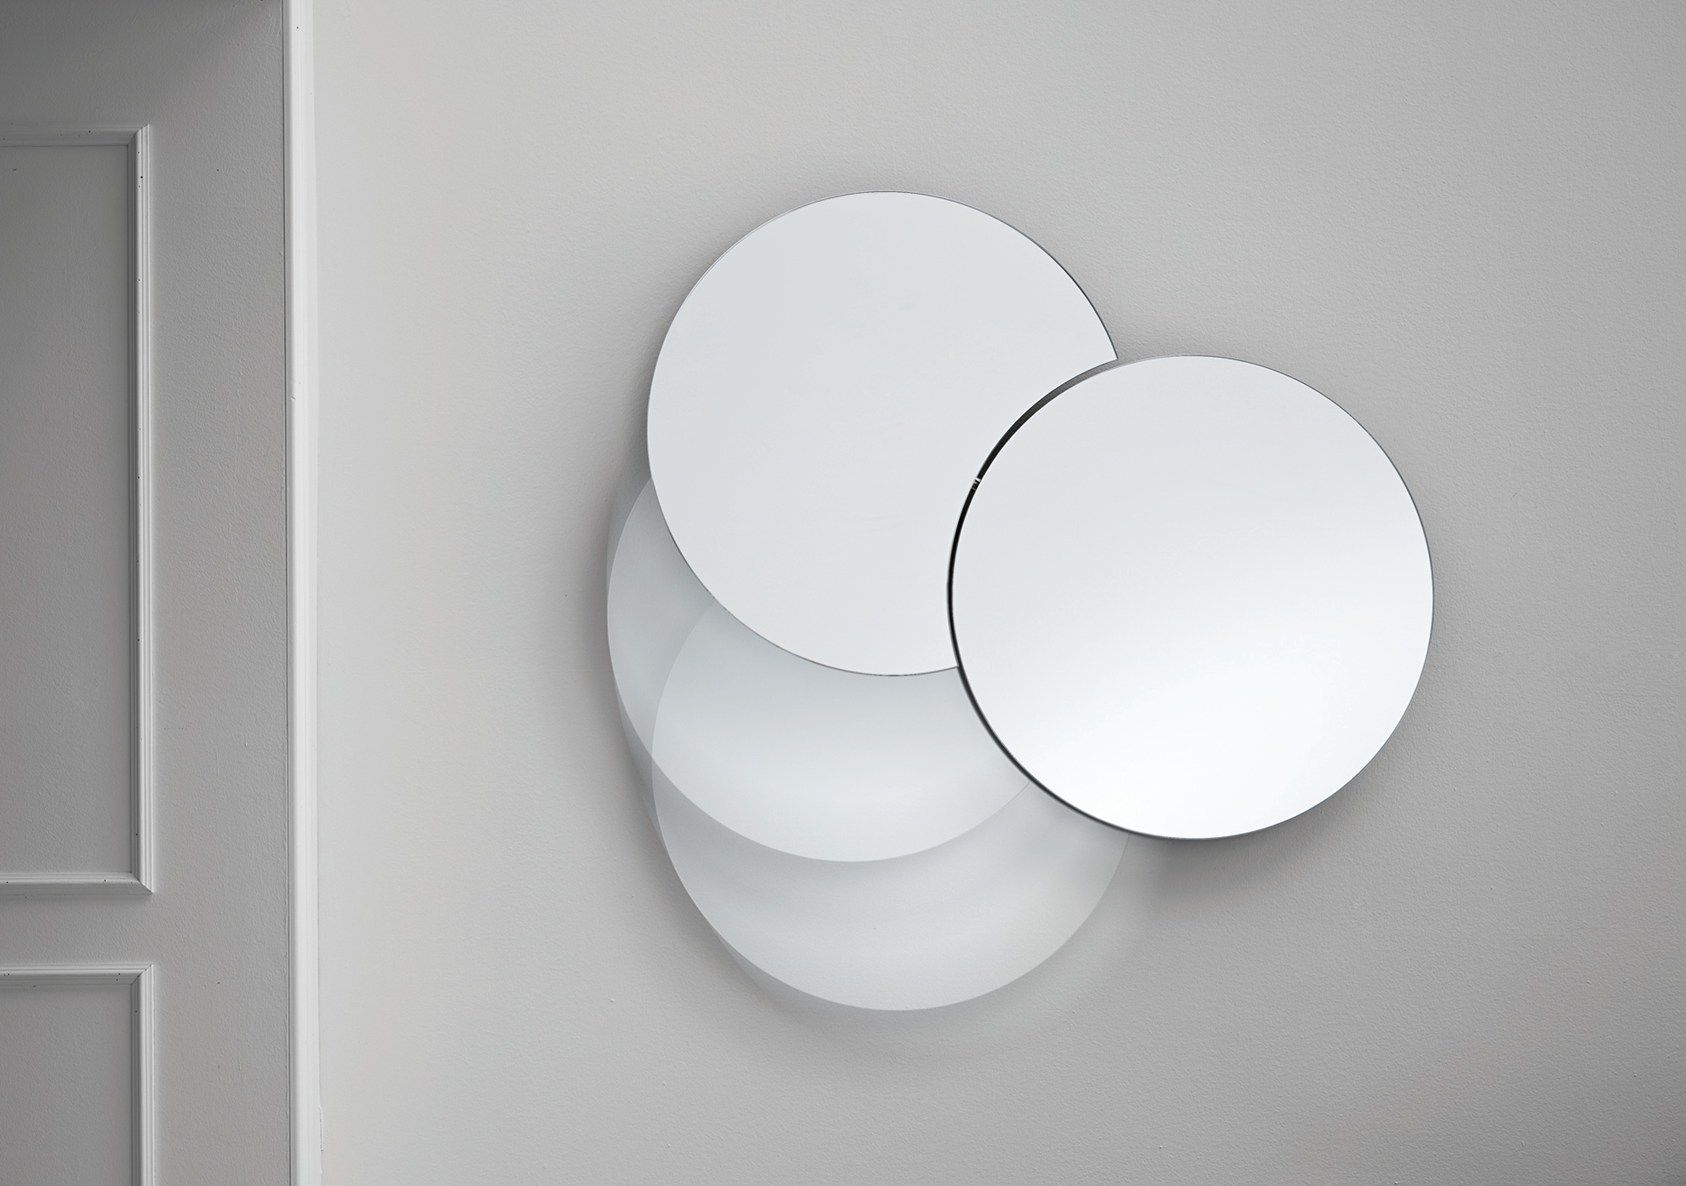 Tonelli Design: designing glass for twenty-five years